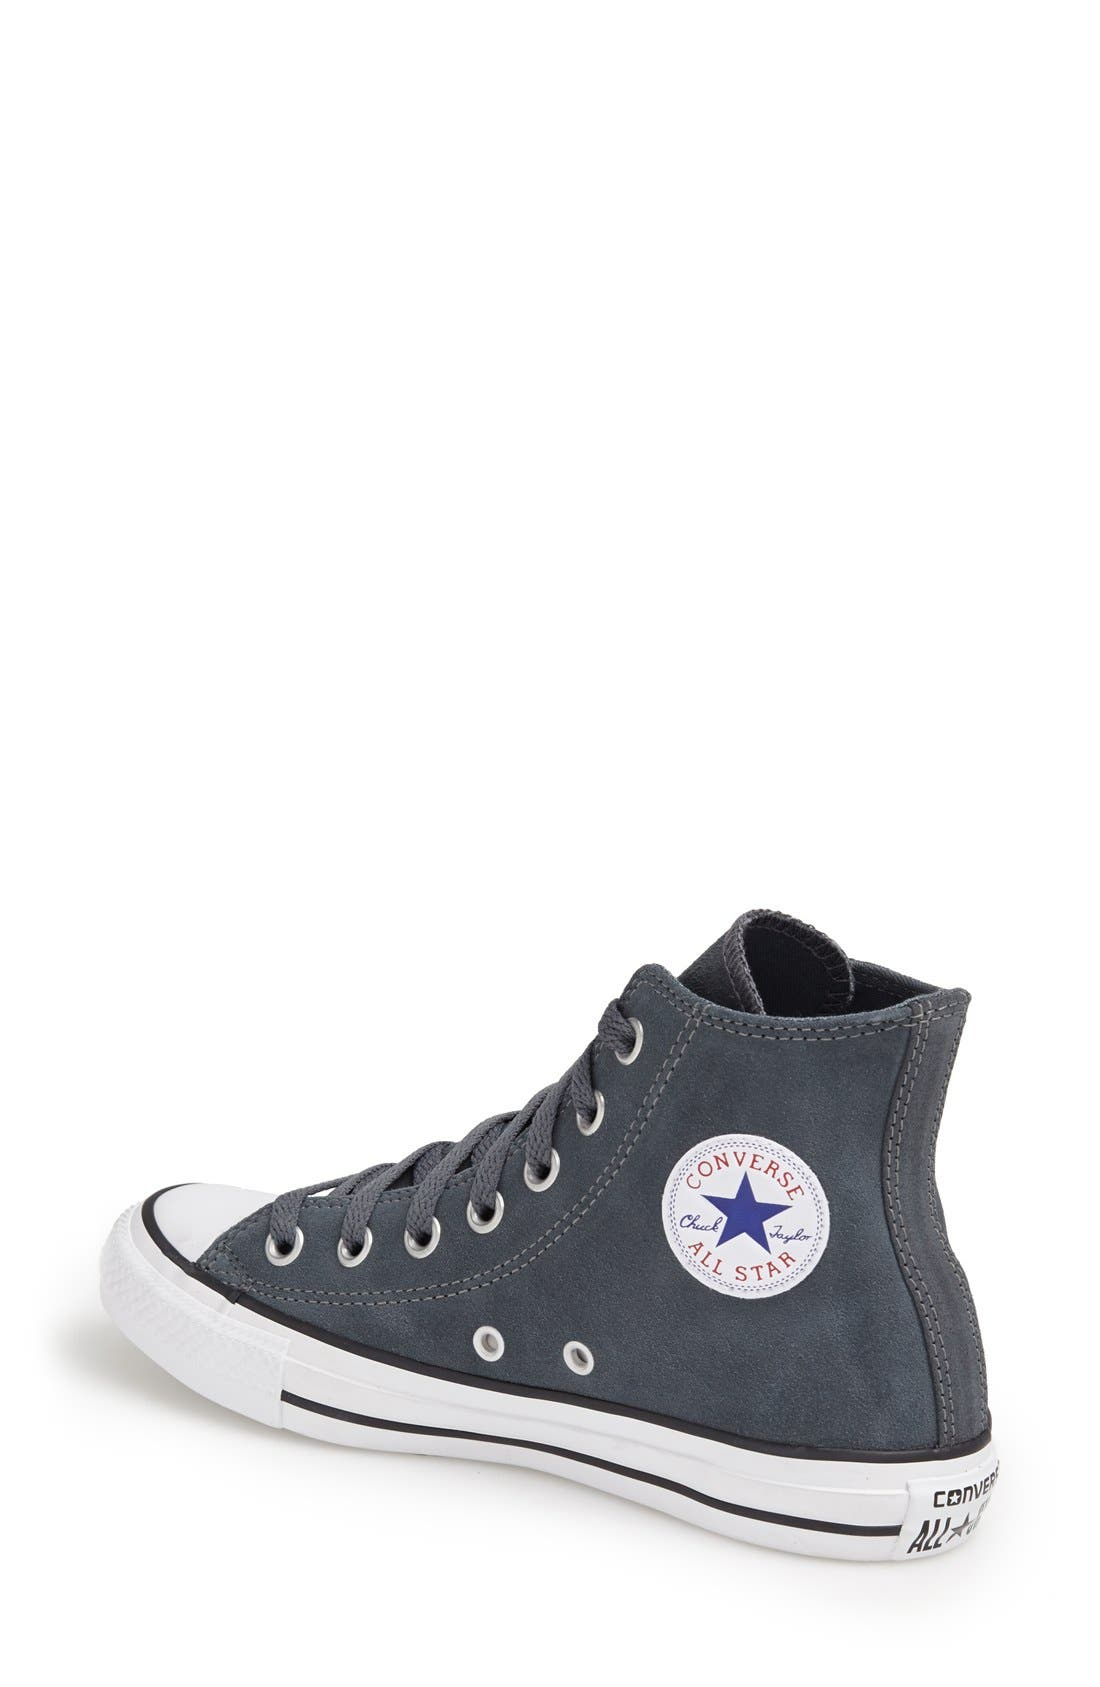 Alternate Image 3  - Converse Chuck Taylor® All Star® Suede High Top Sneaker (Women)